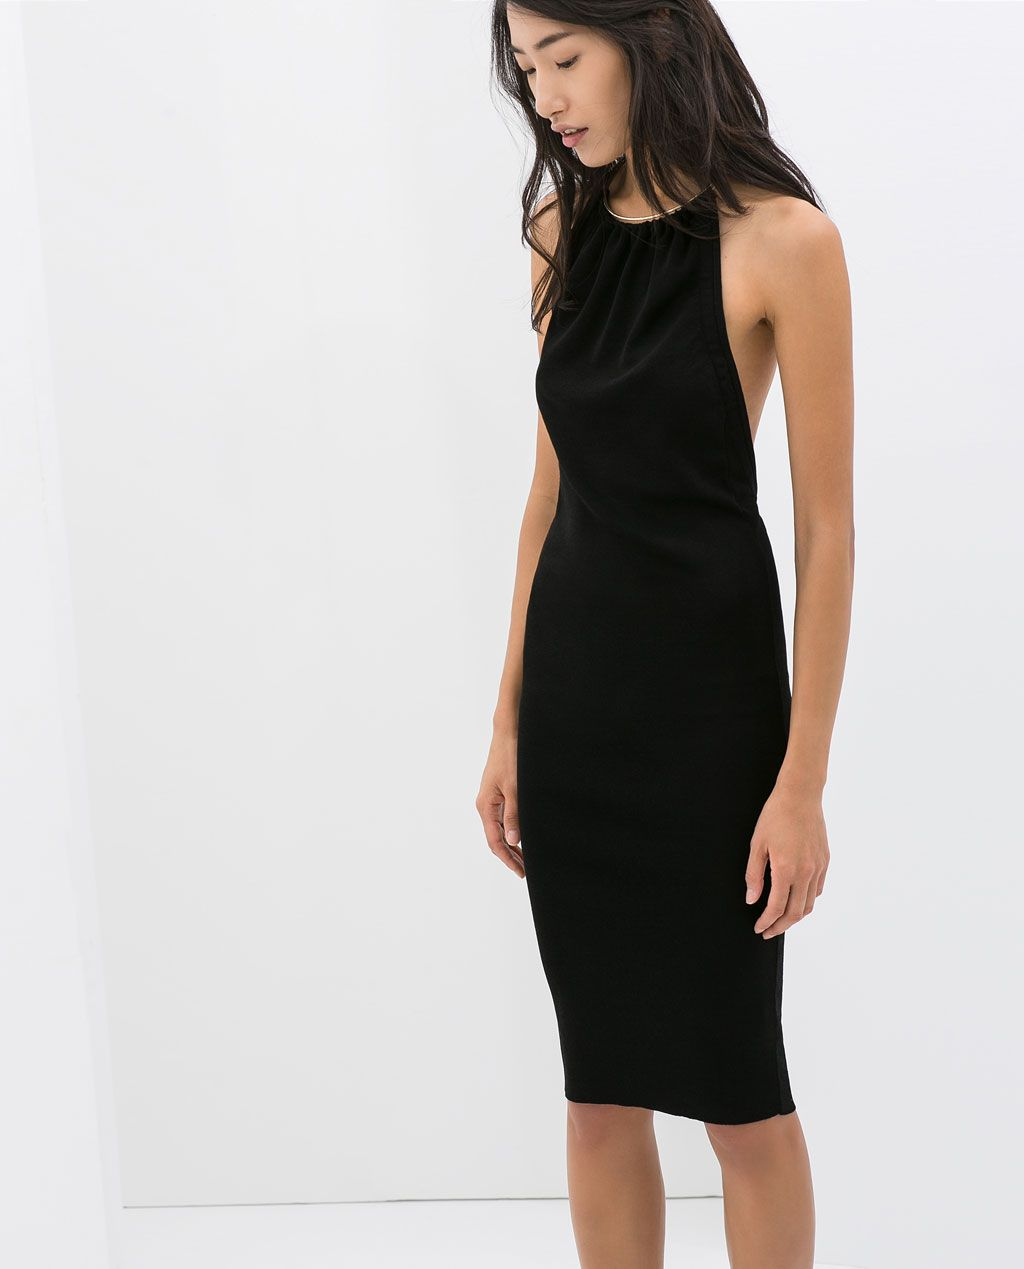 zara  woman  open back dress with metal collar  dress